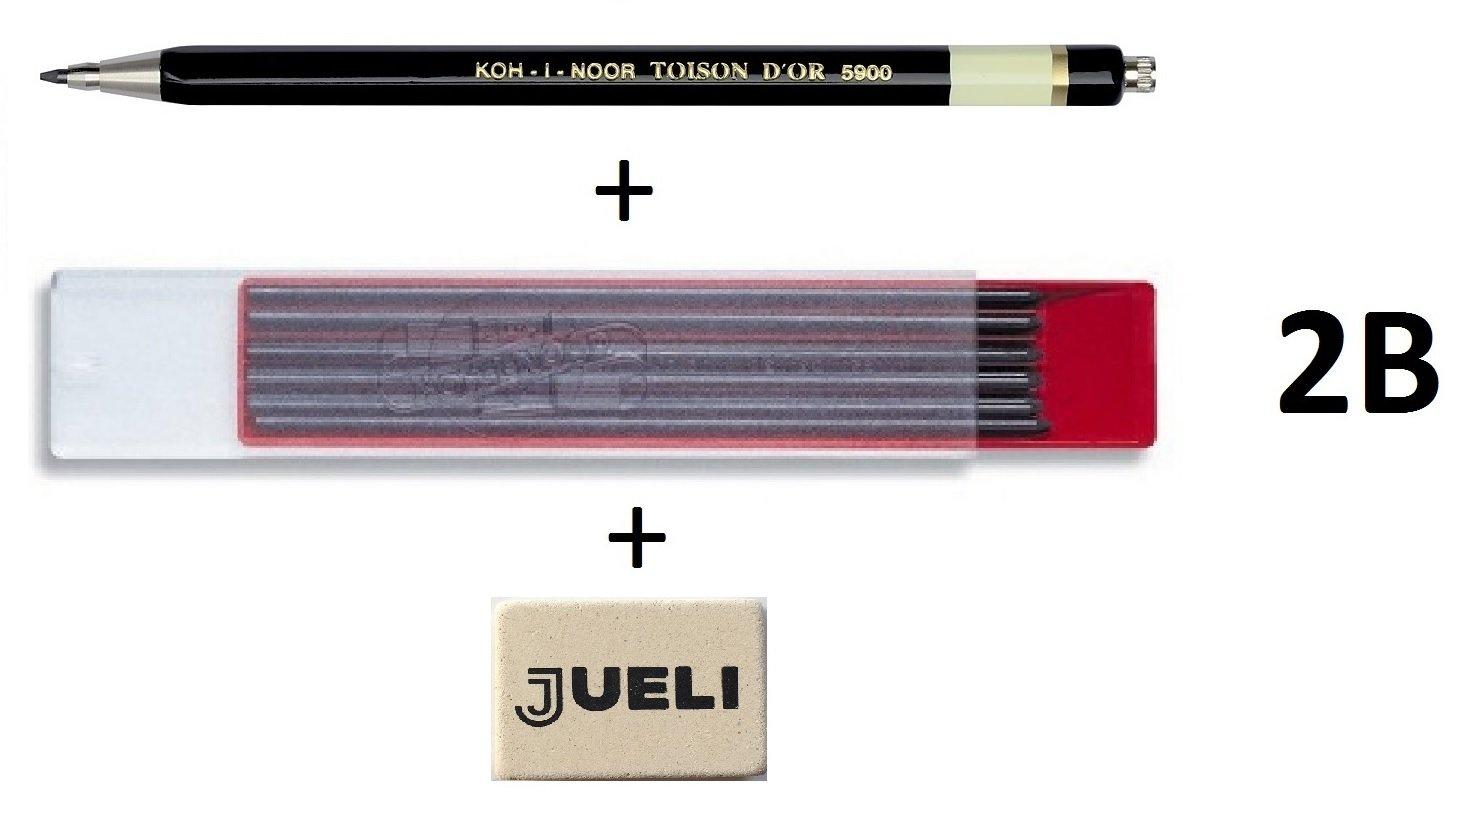 Rot Koh-I-Noor Fallminen /Ø 2 mm Druckbleistift kurz